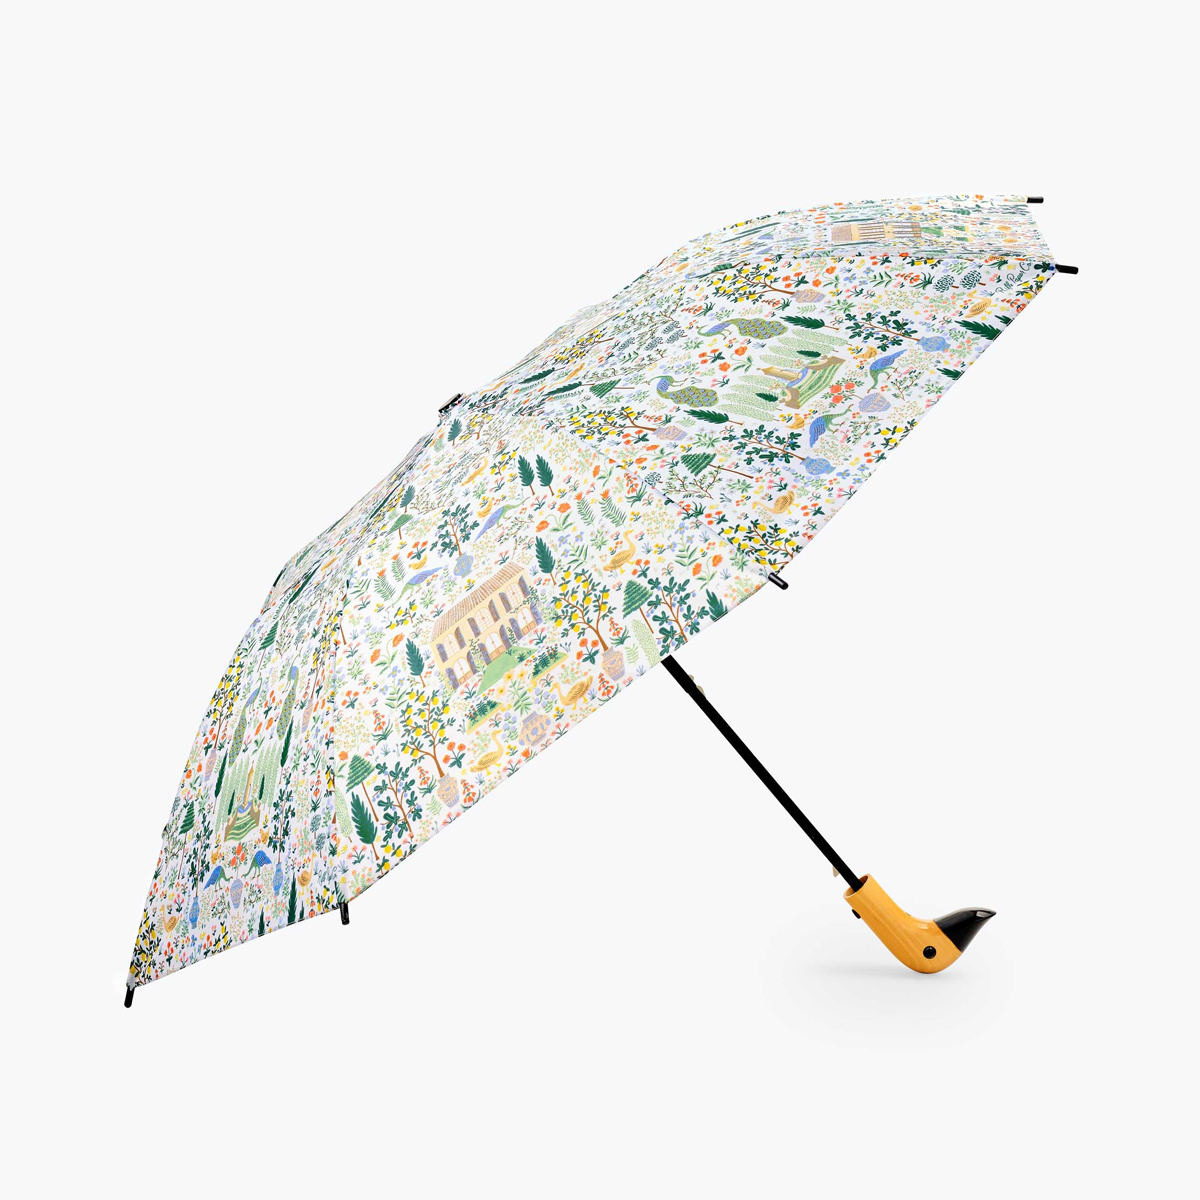 Rifle Paper Co - RP Rifle Paper Co - Camont Umbrella